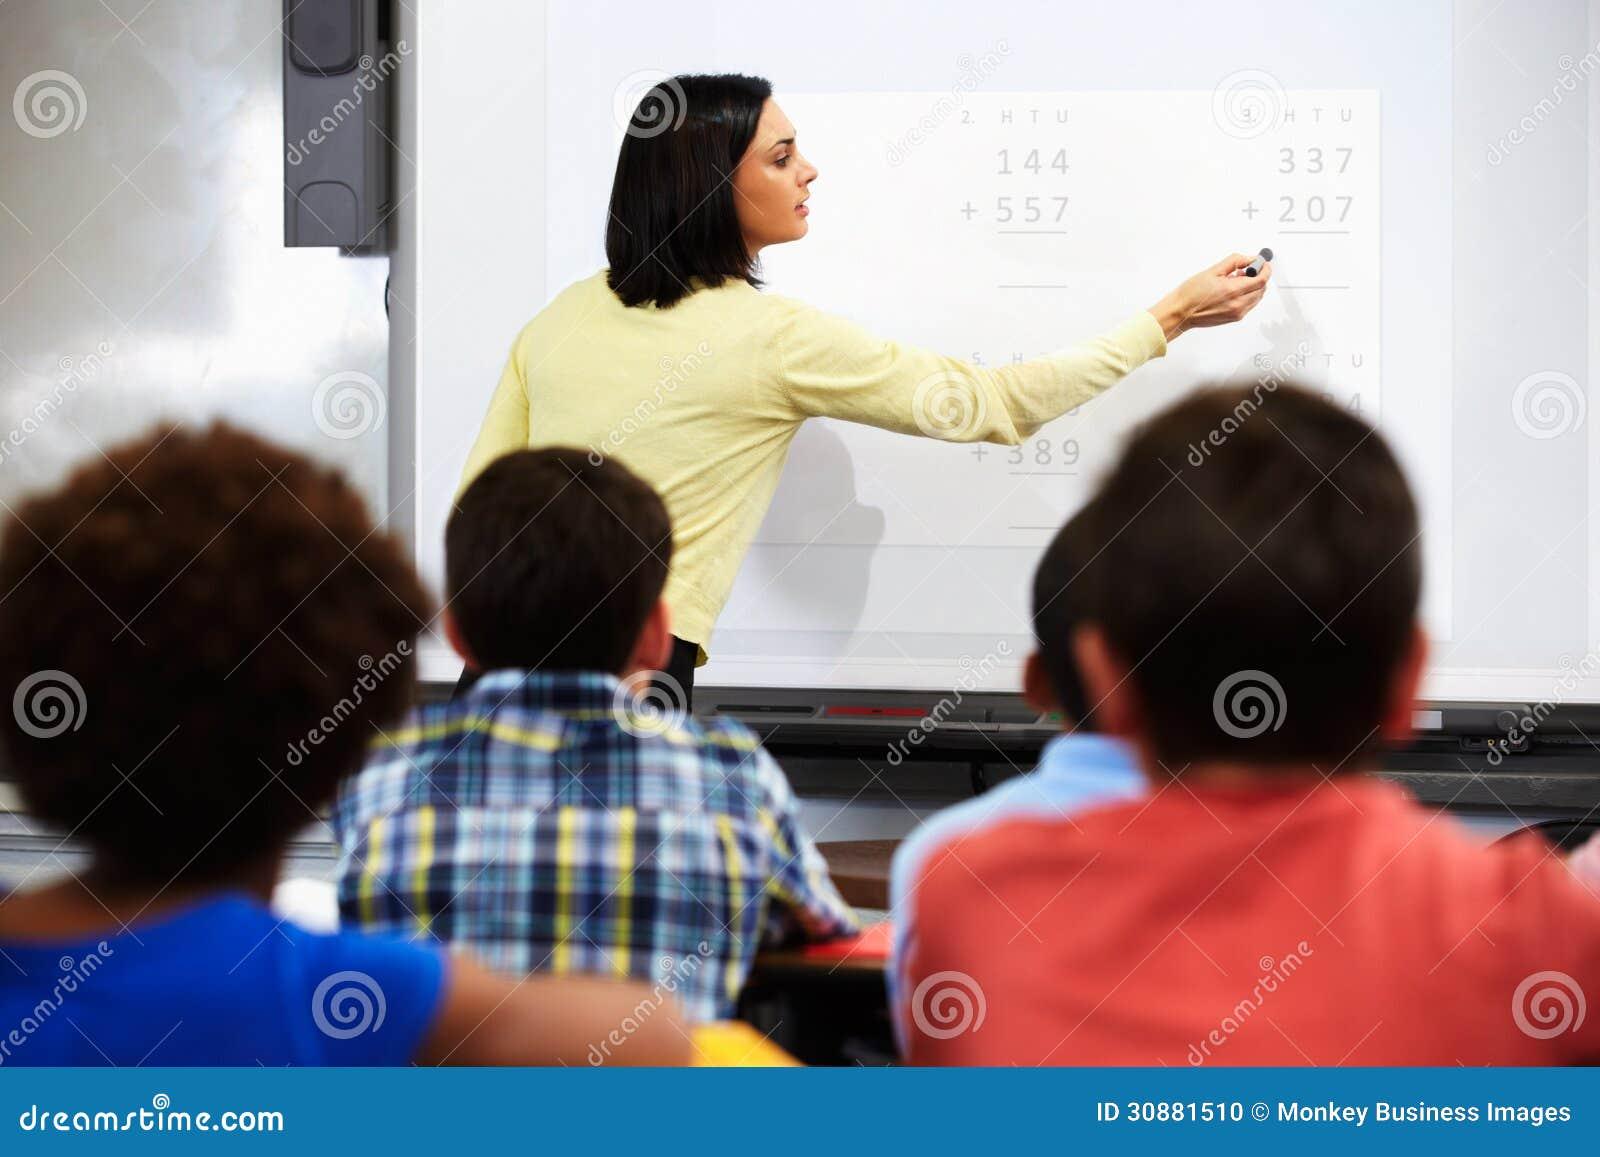 Teacher Standing In Class Using Interactive Whiteboard